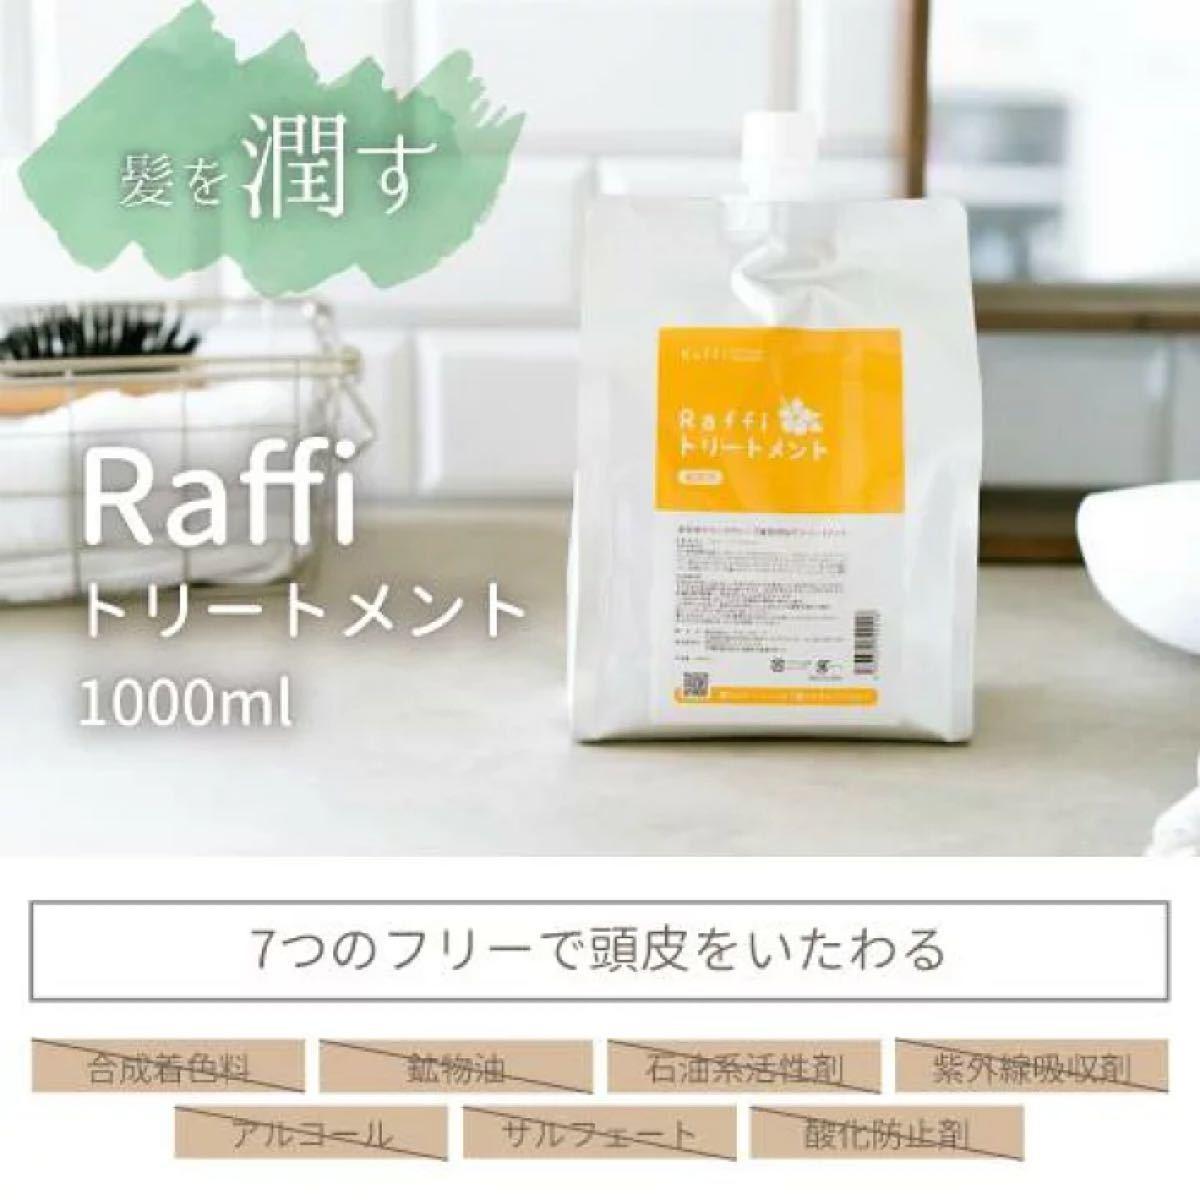 Raffi シャンプー&トリートメント各1000mlセット